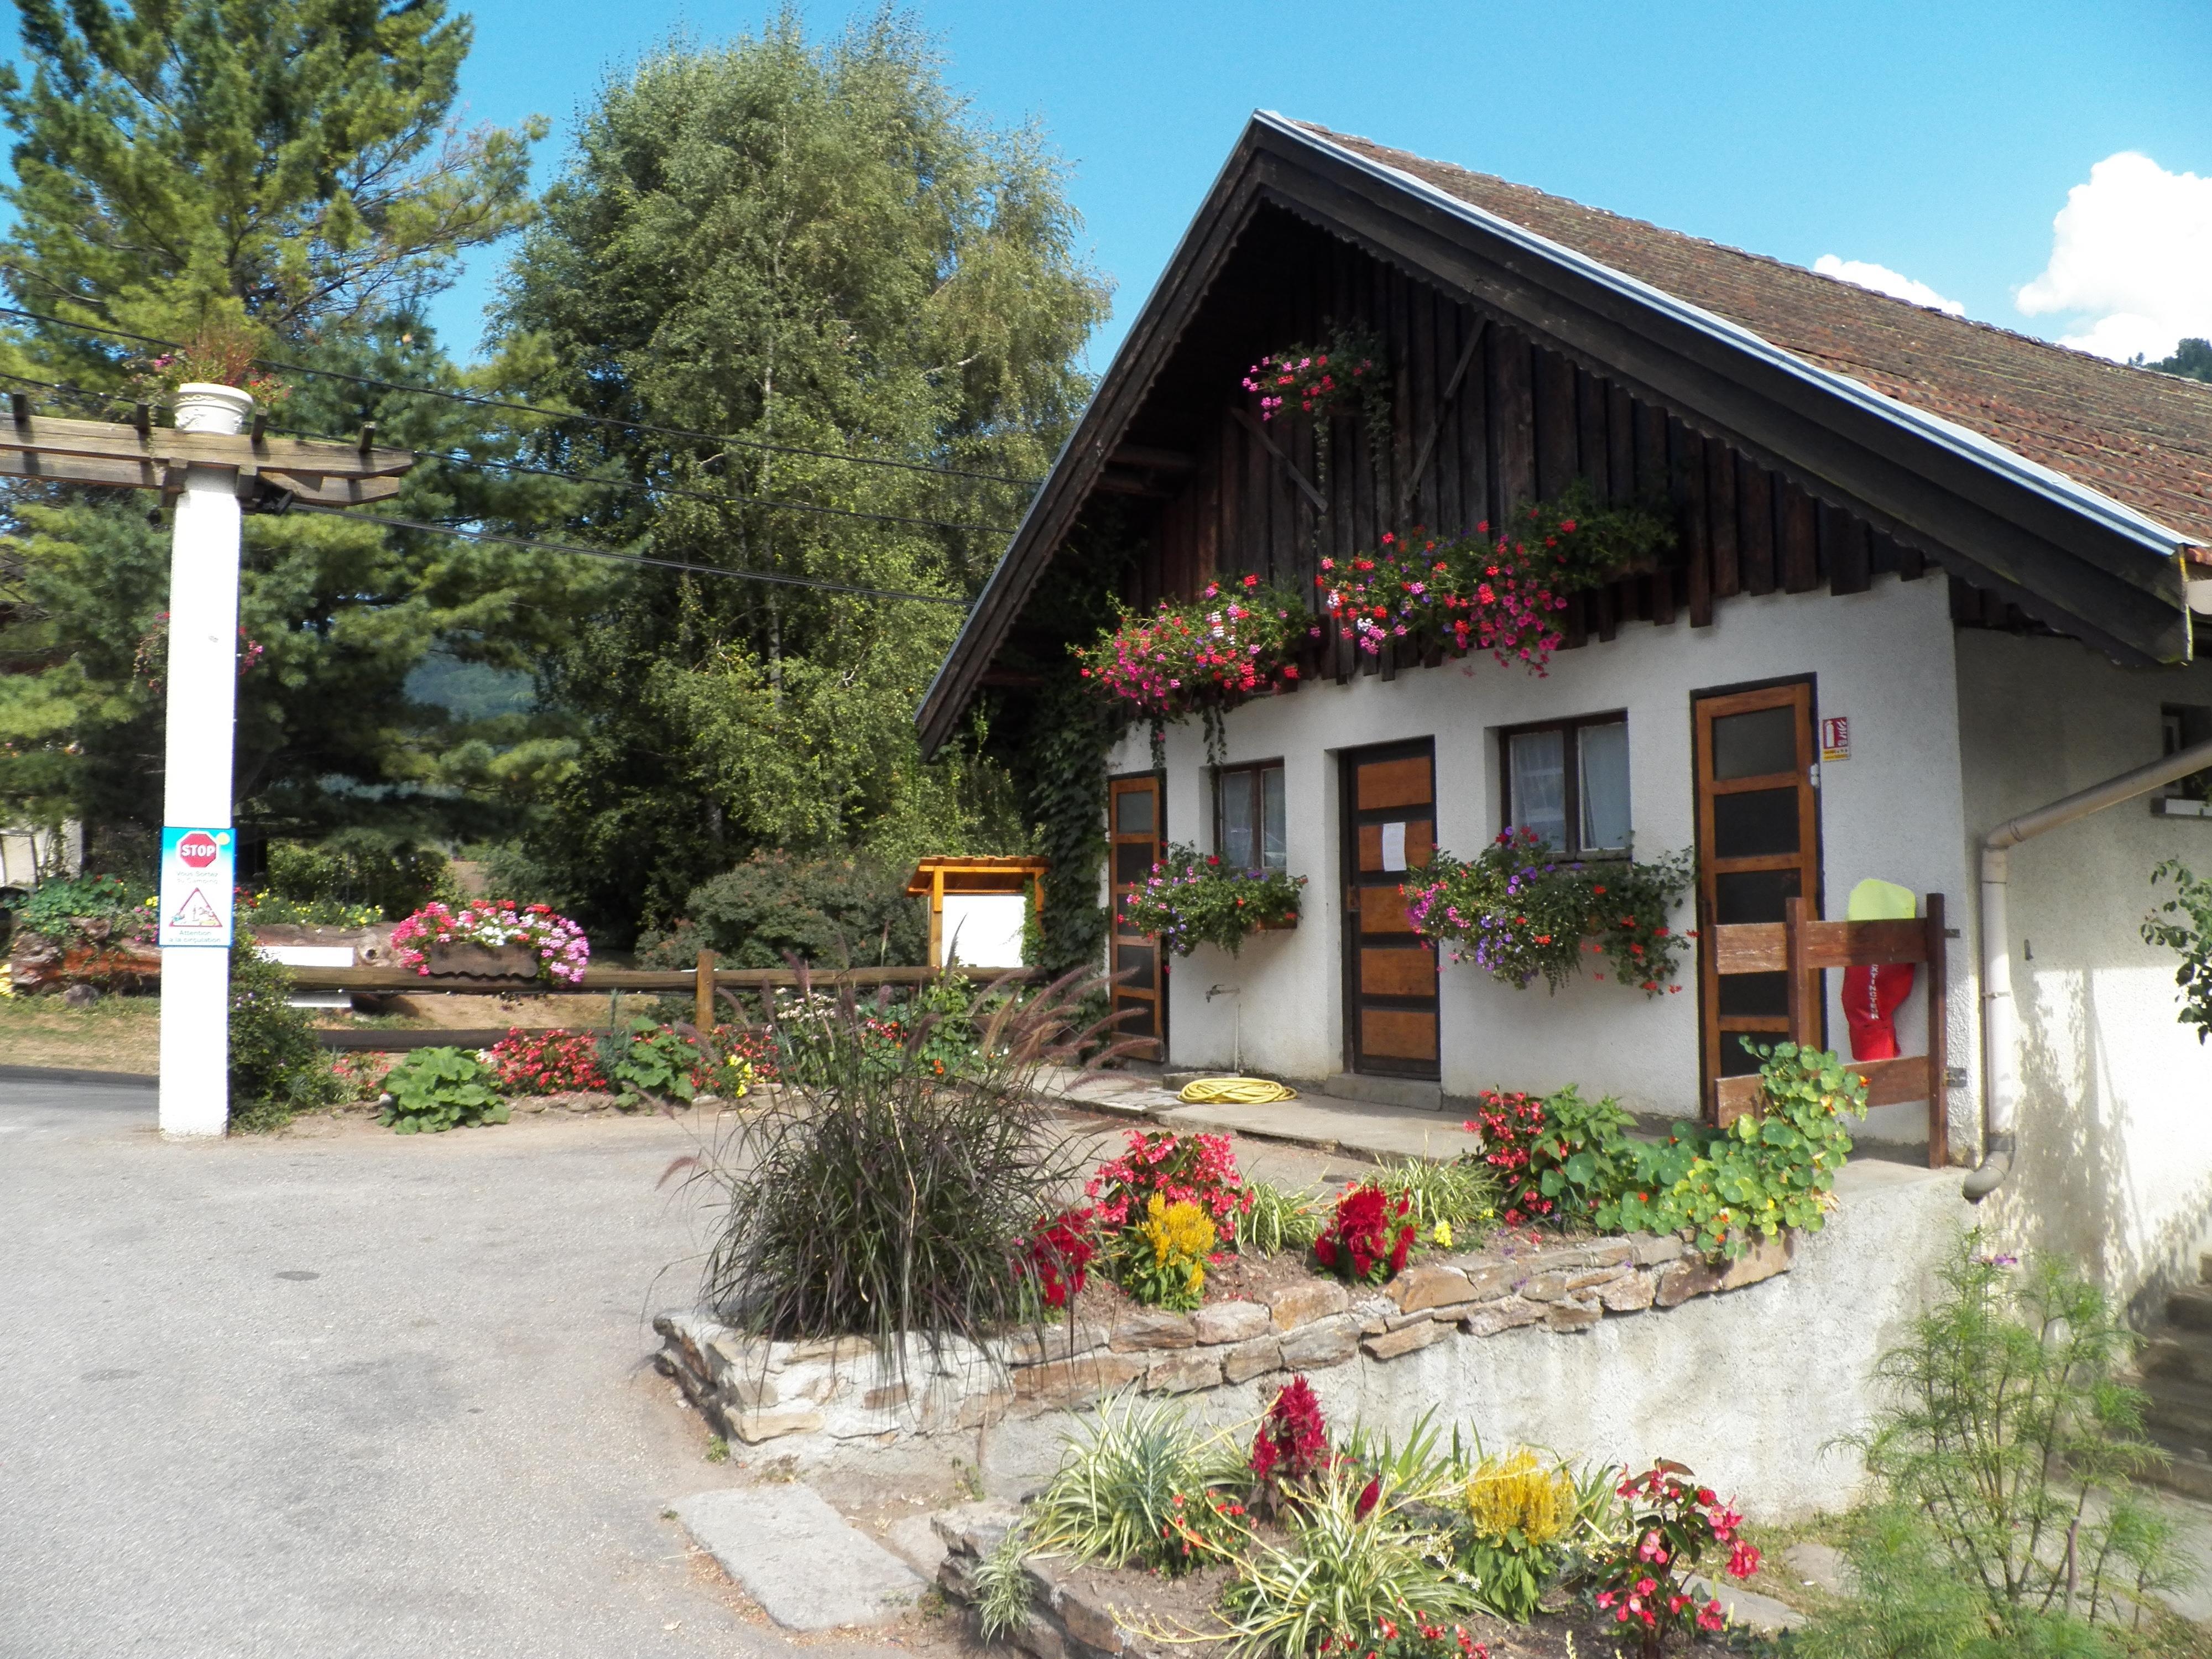 Camping Clair Matin, Allevard, Isère